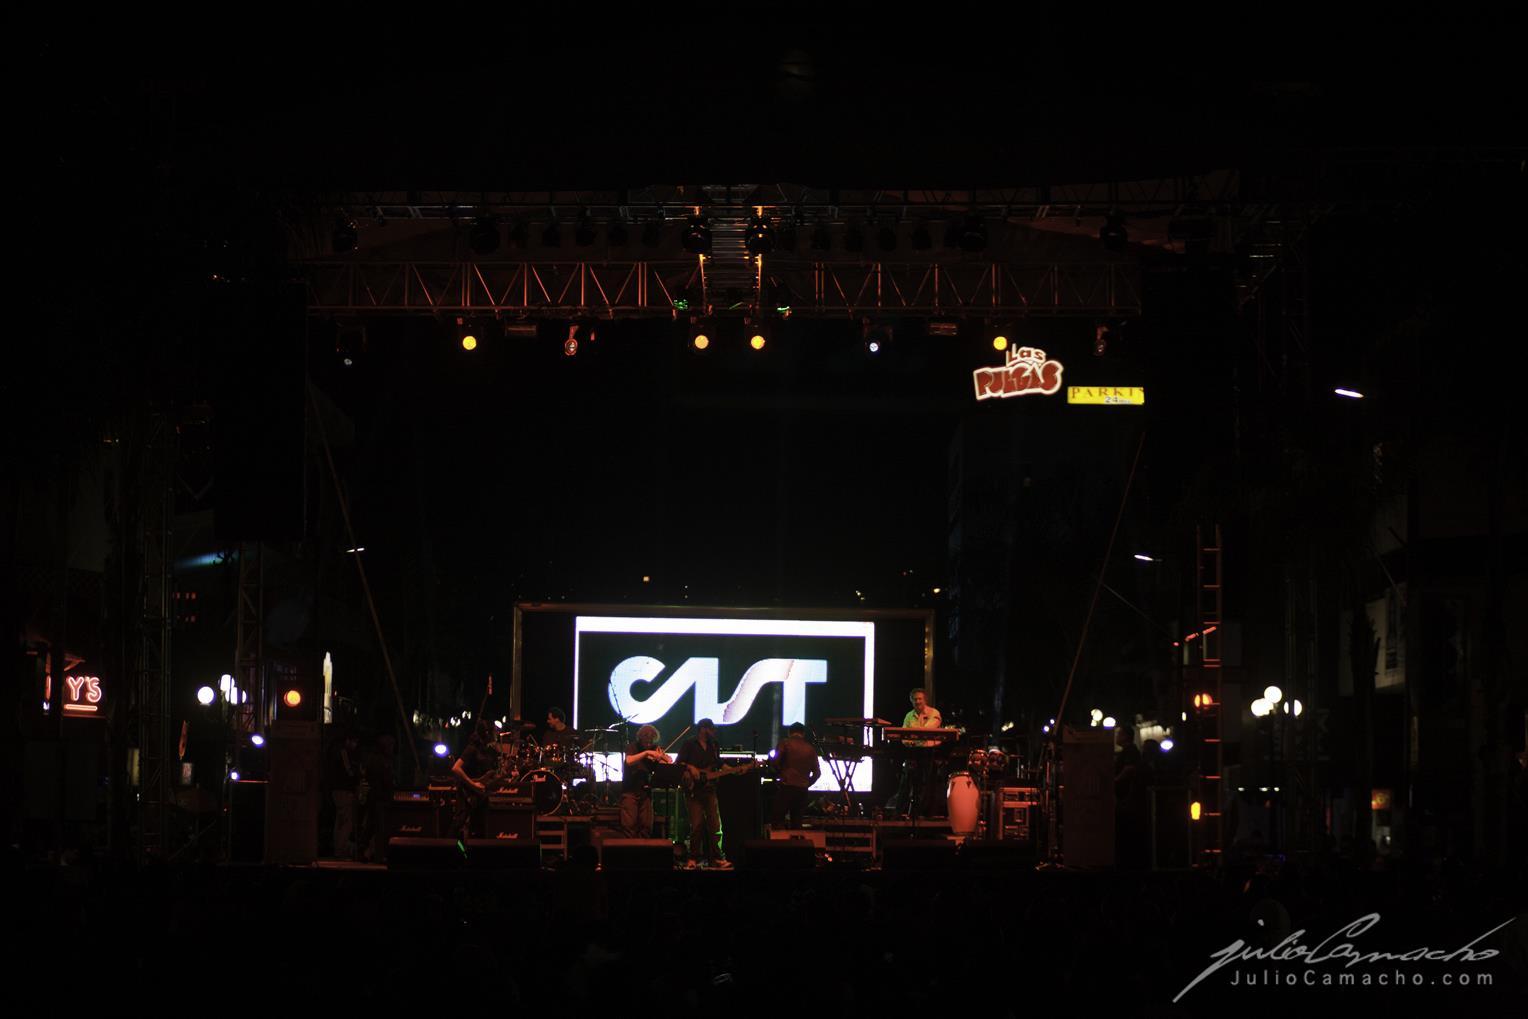 2014-10-30 31 CAST TOUR Ensenada y Tijuana - 1441 - www.Juli (Copy).jpg